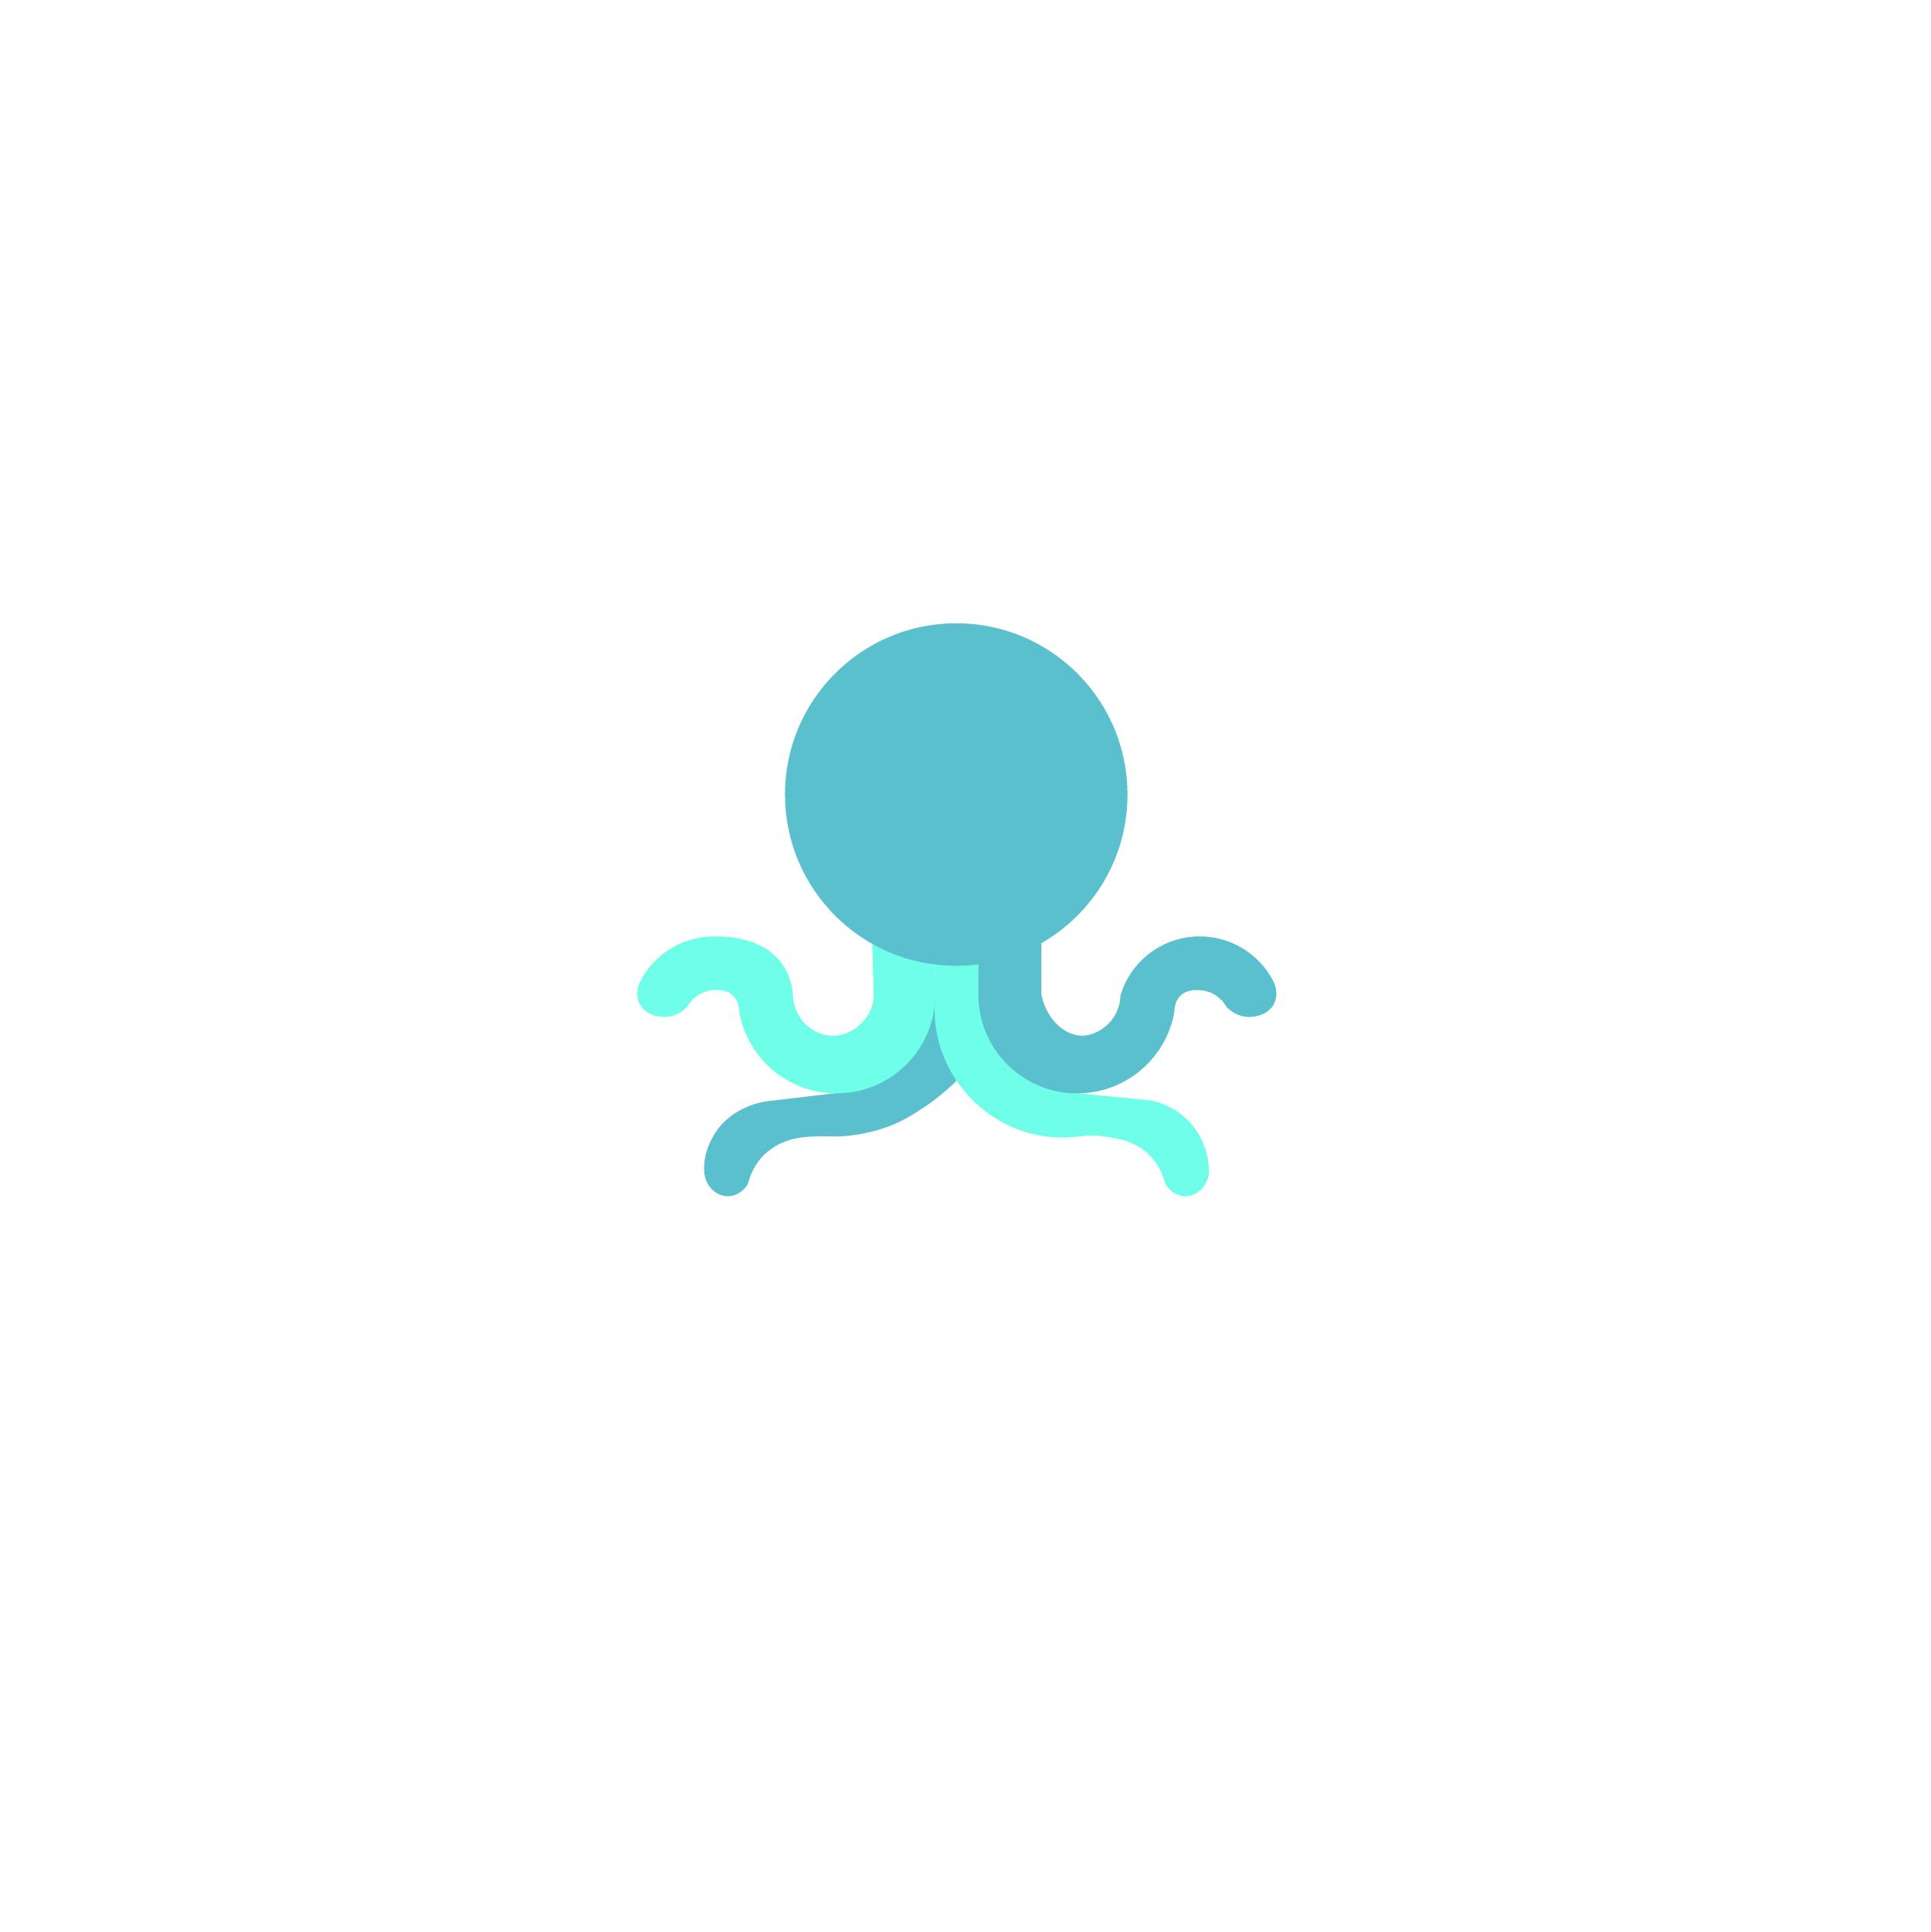 LogoFolio - Jellyfish-01